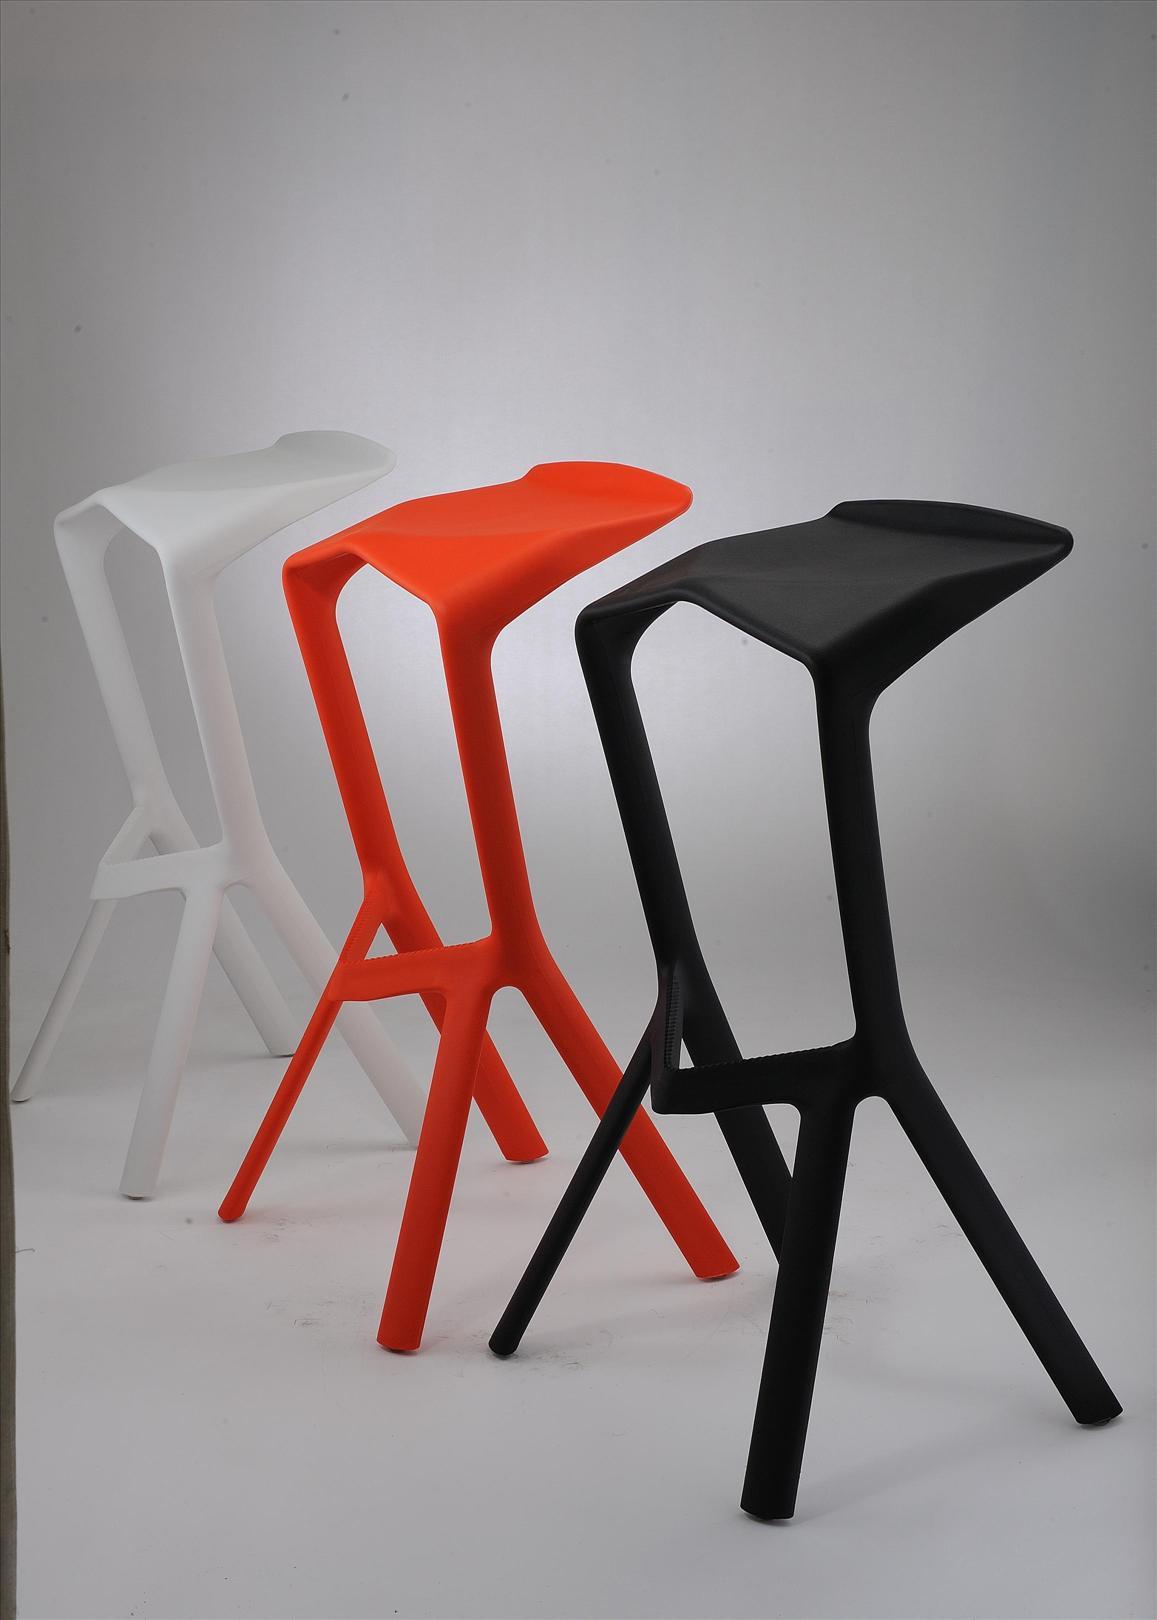 chair  designer chair  cafeteria (end   am) - chair  designer chair  cafeteria chairs  plastic chair